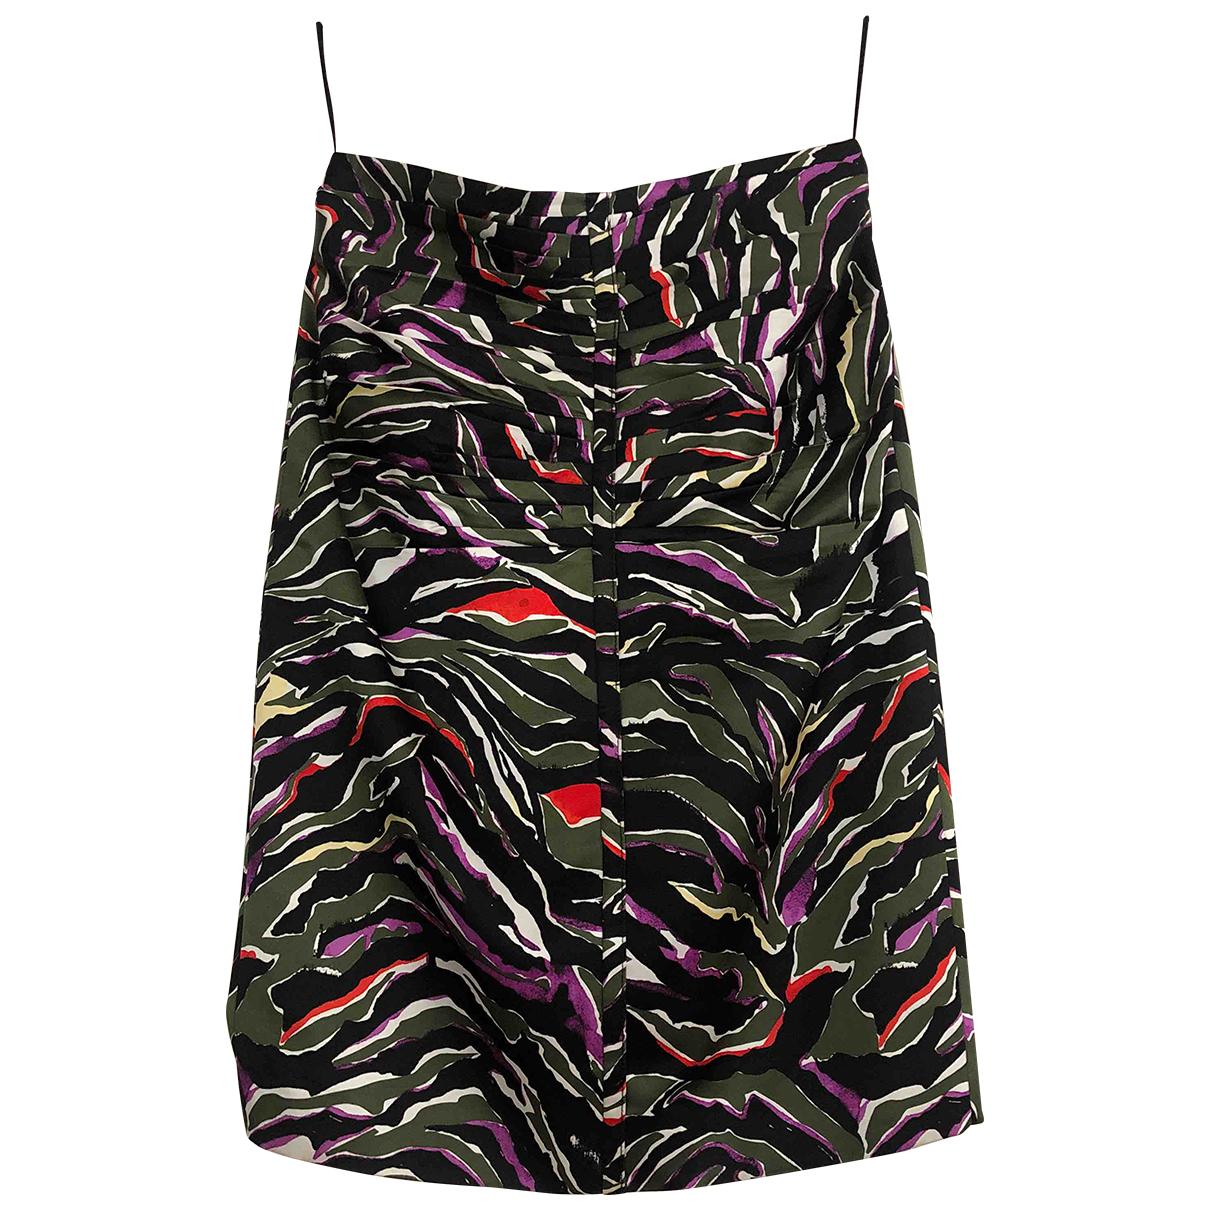 Balenciaga N Multicolour Cotton skirt for Women 40 FR